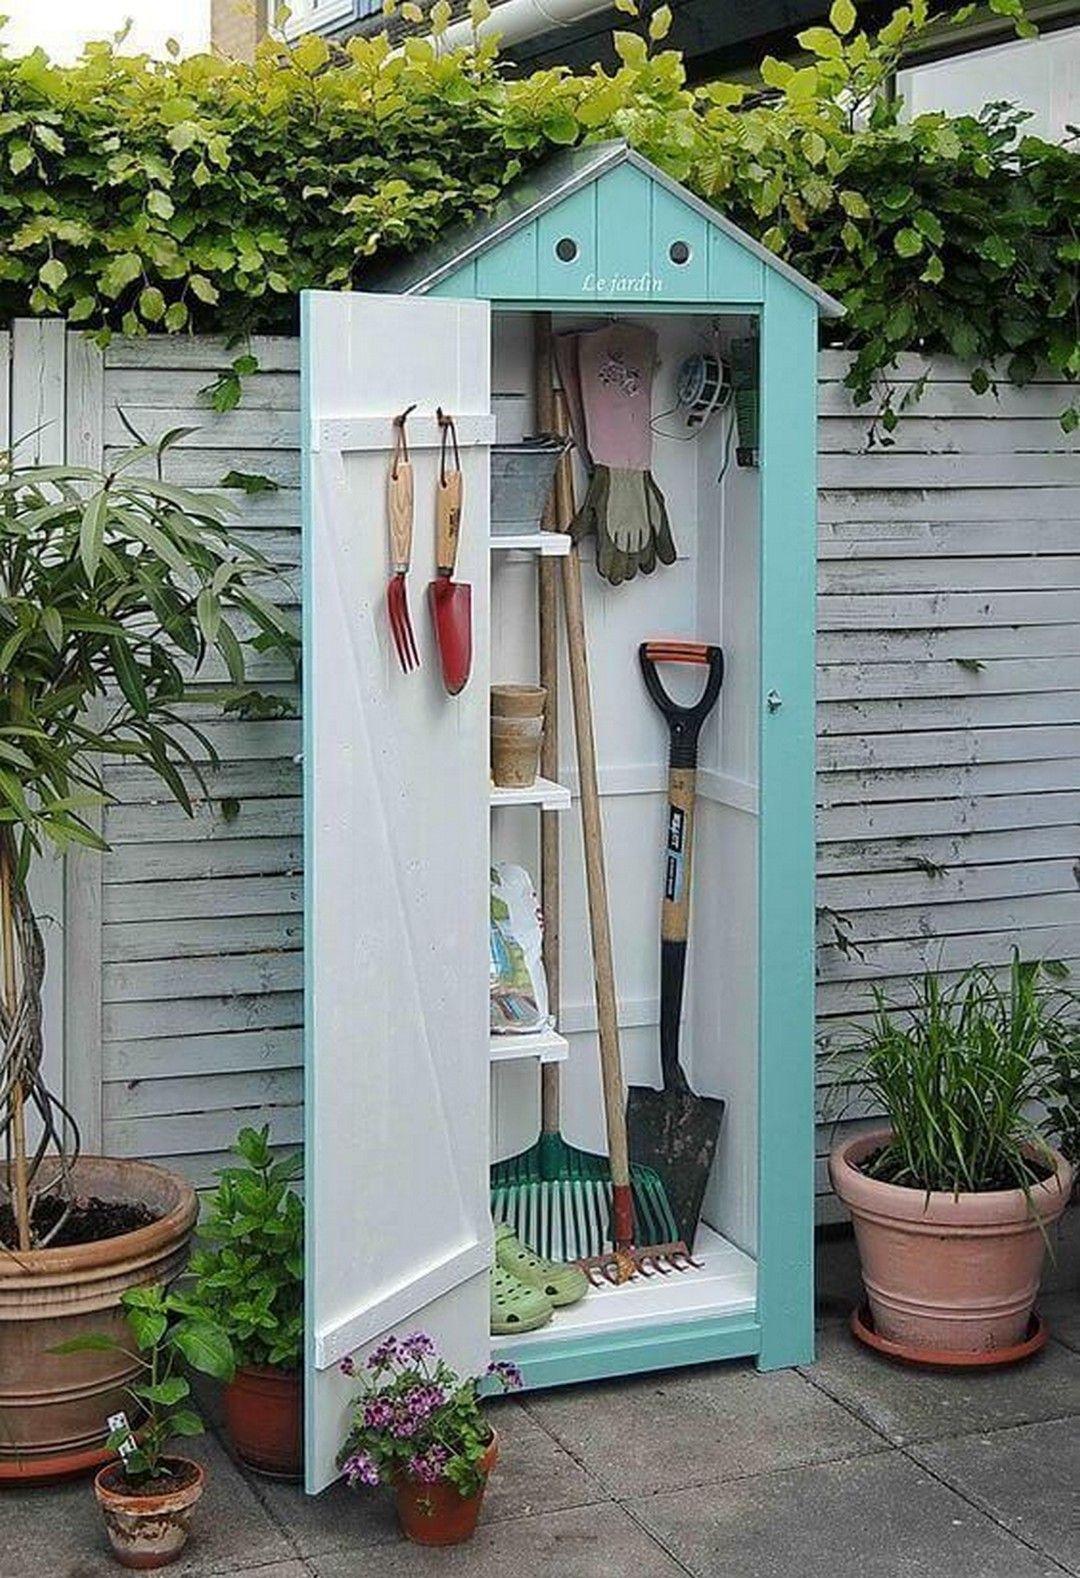 33 Diy Garden Tool Storage Idea That Will Save Your Sanity Small Backyard Design Backyard Design Small Backyard Backyard garden tool storage